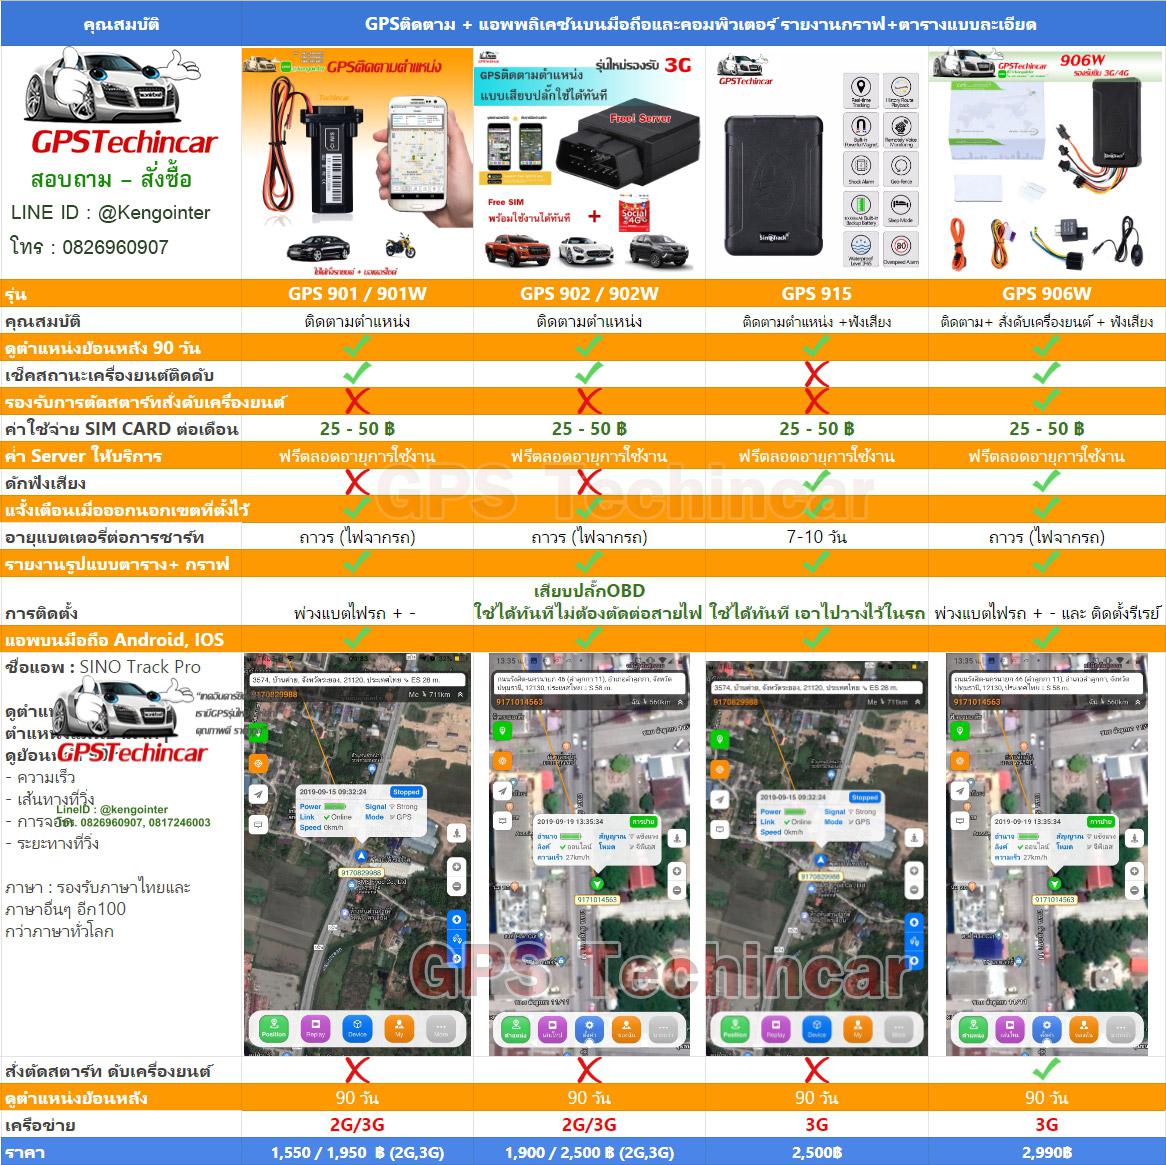 3G-เทียบเสปกGPSติดตามรถ-SINO-GPS-Techincar-THailand